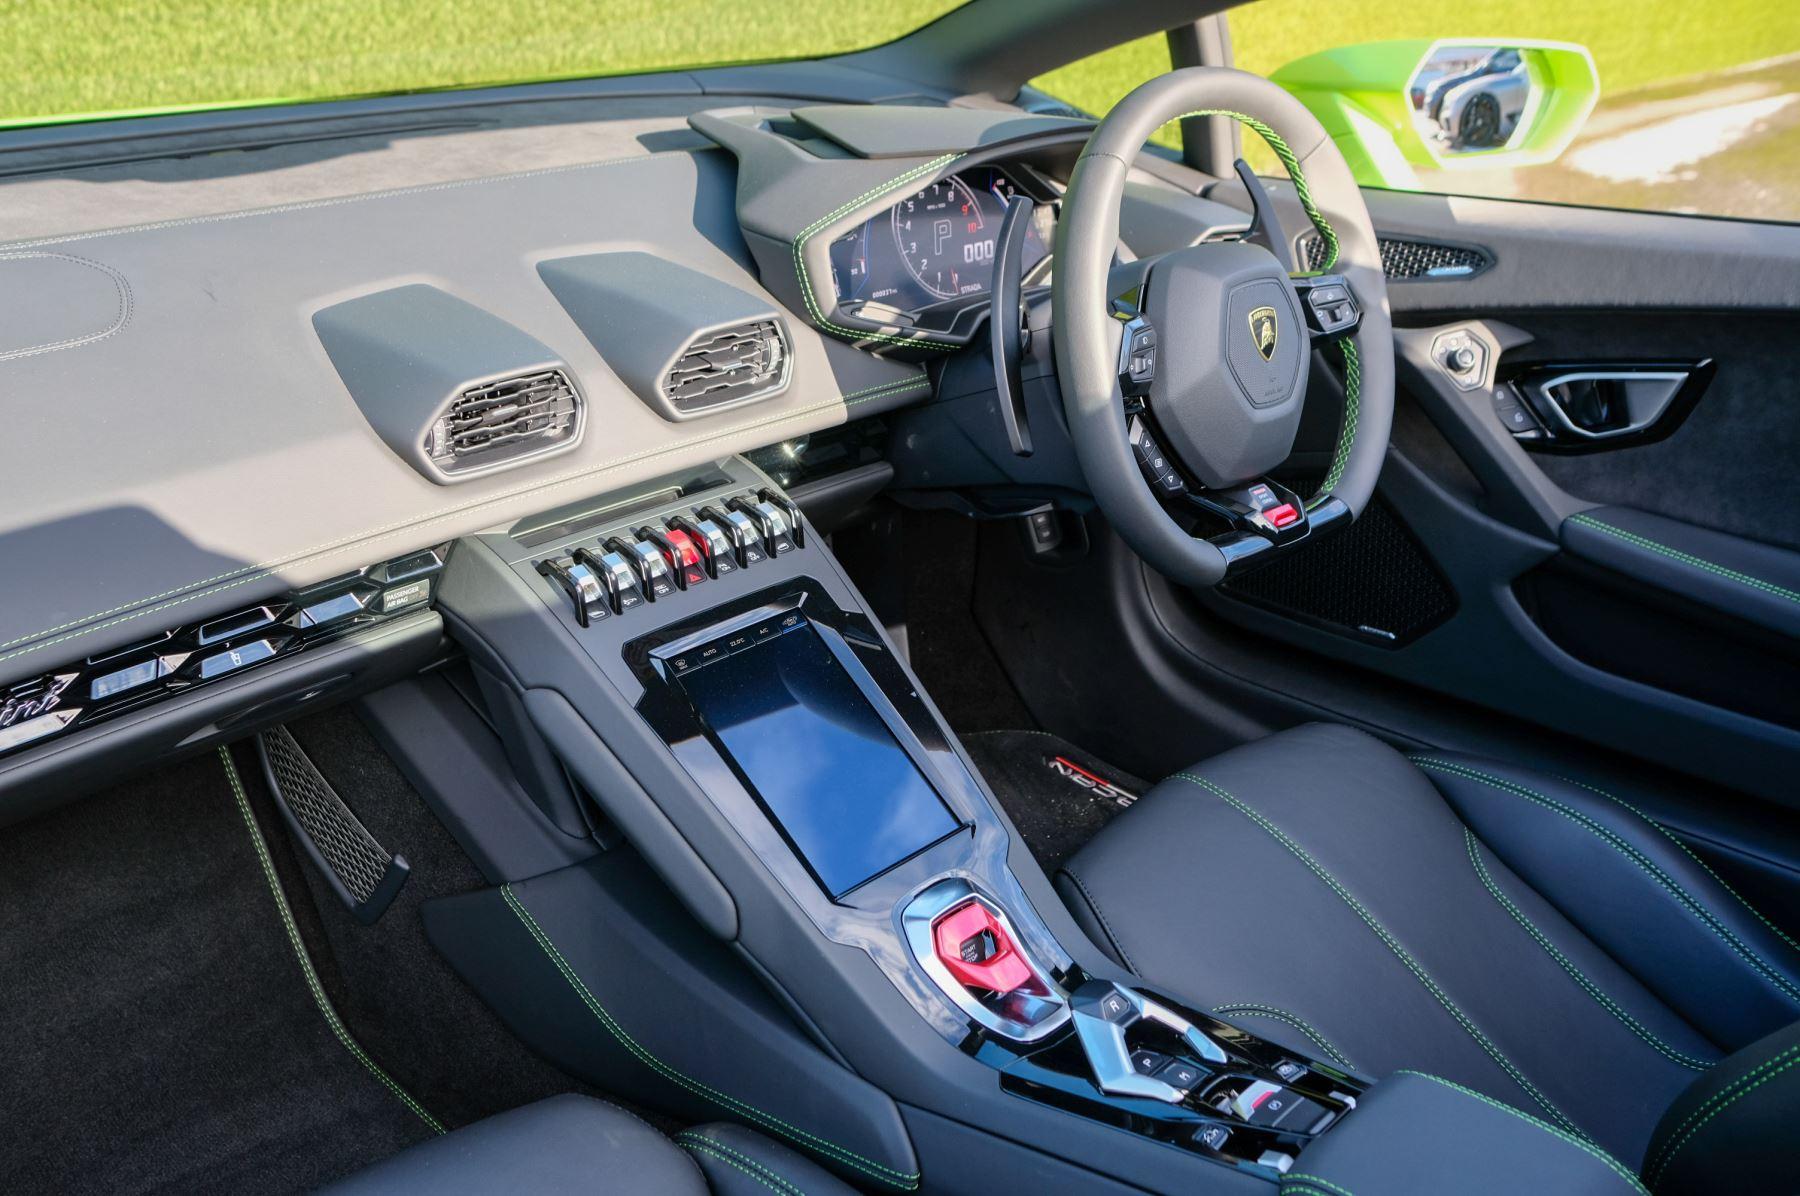 Lamborghini Huracan EVO Spyder 5.2 V10 610 2dr Auto image 7